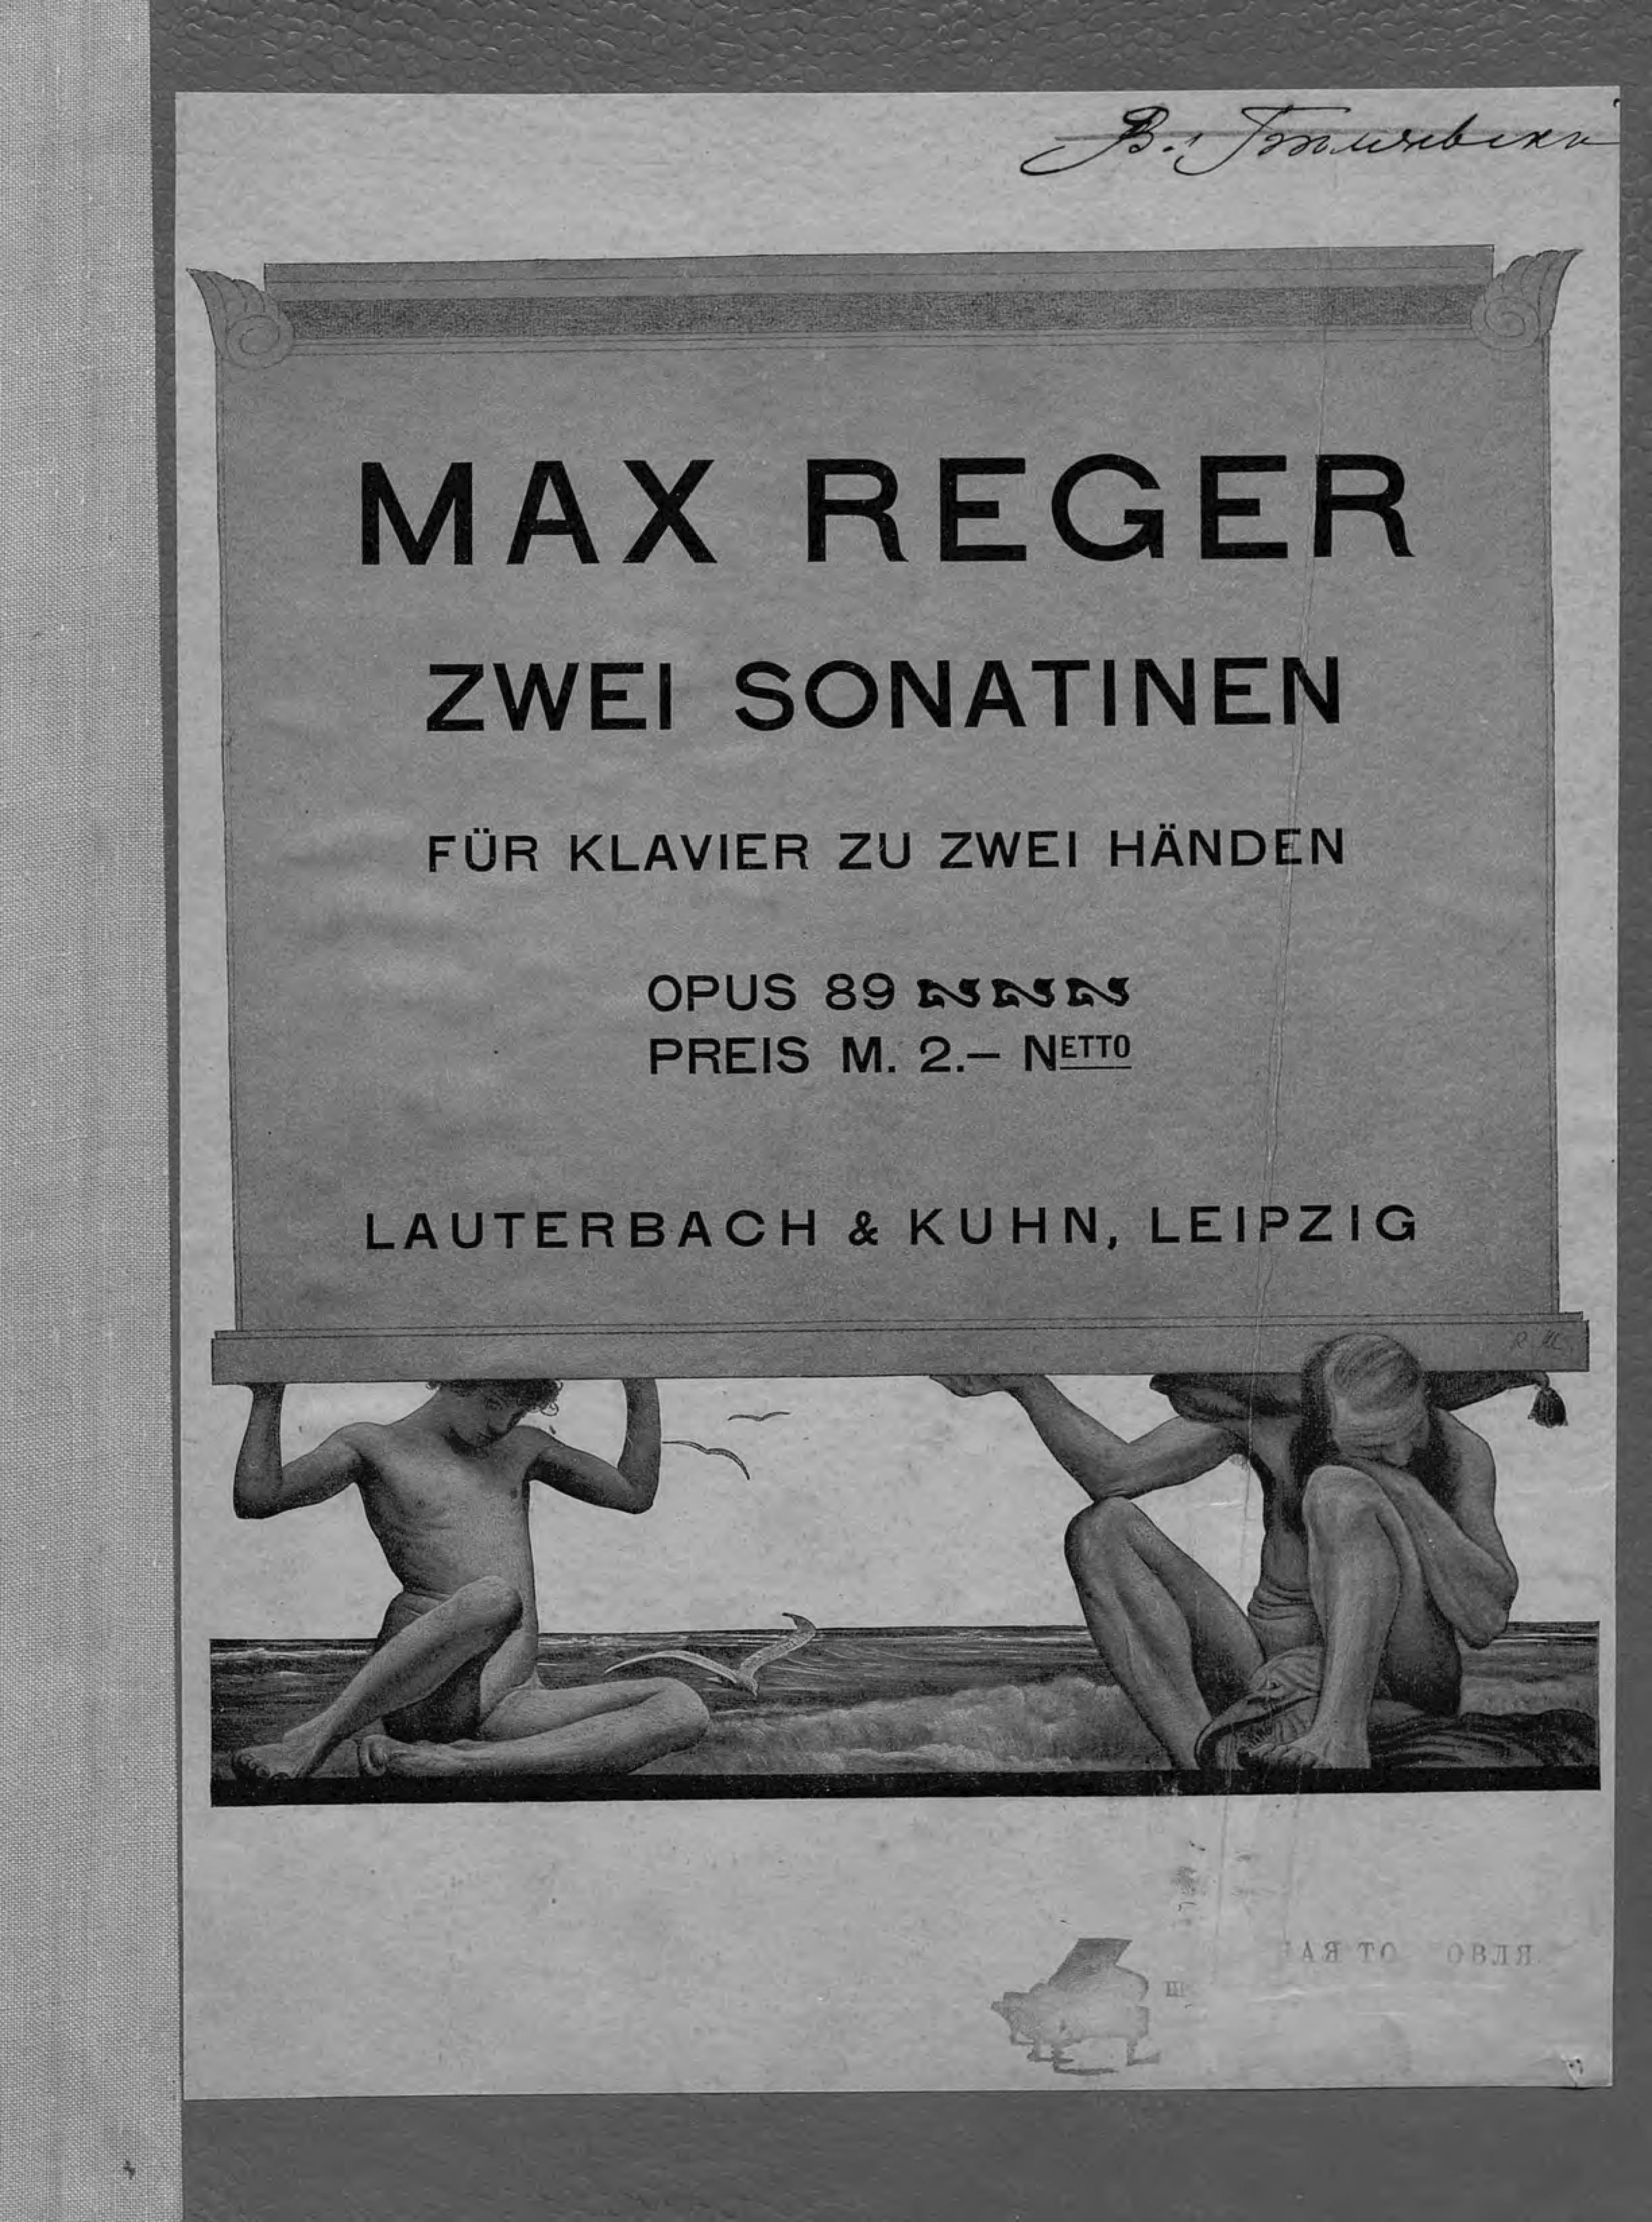 Макс Регер Zwei Sonatinen fur Klavier zu 2 Hd. komp. v. Max Reger g schumann 3 stucke fur klavier op 23